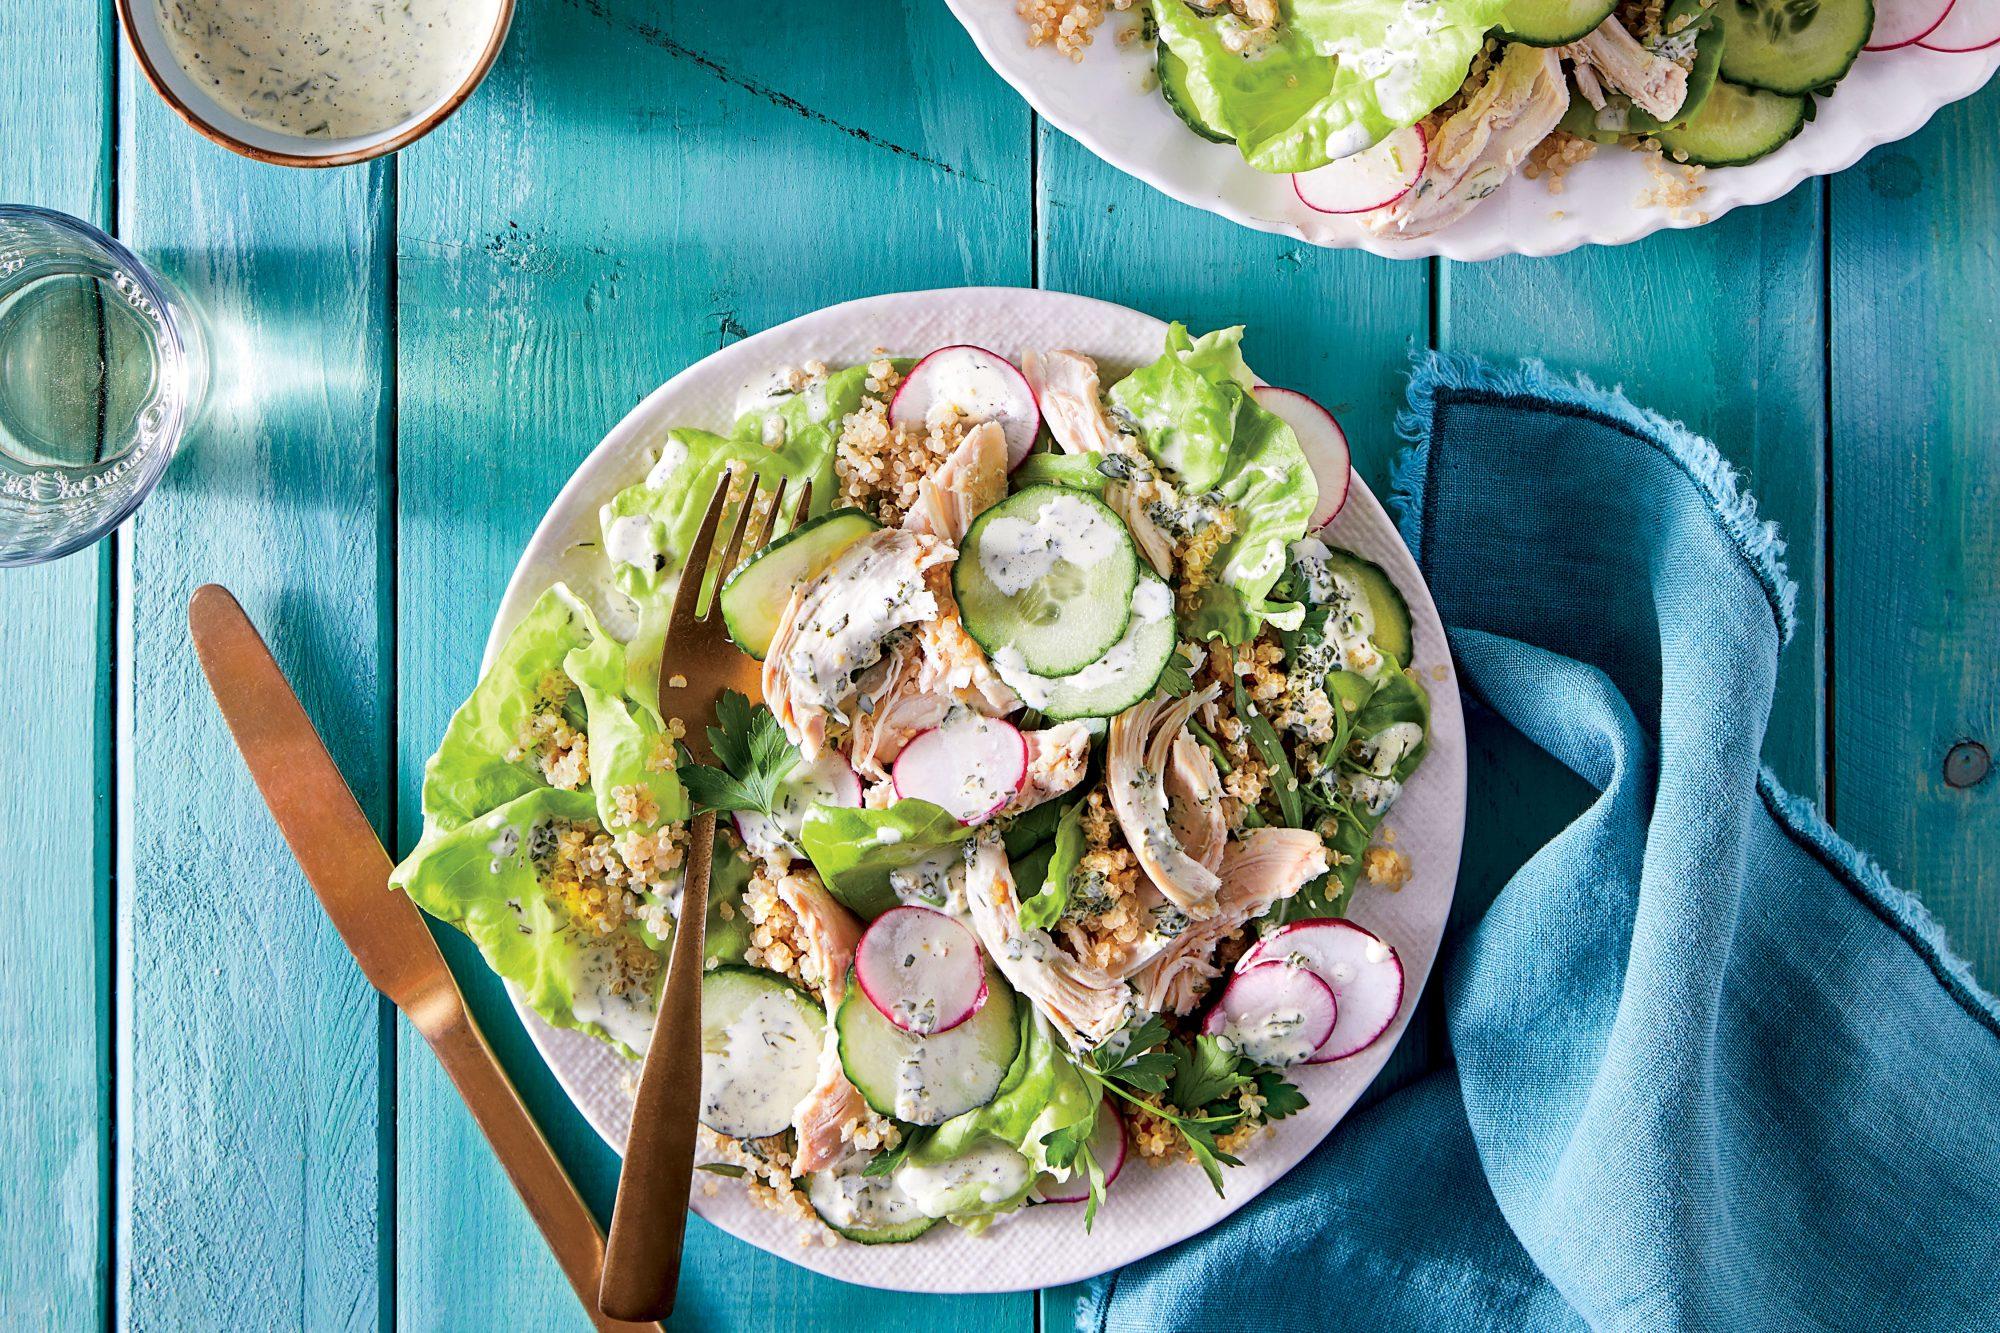 Chicken-Quinoa Salad with Green Goddess Dressing